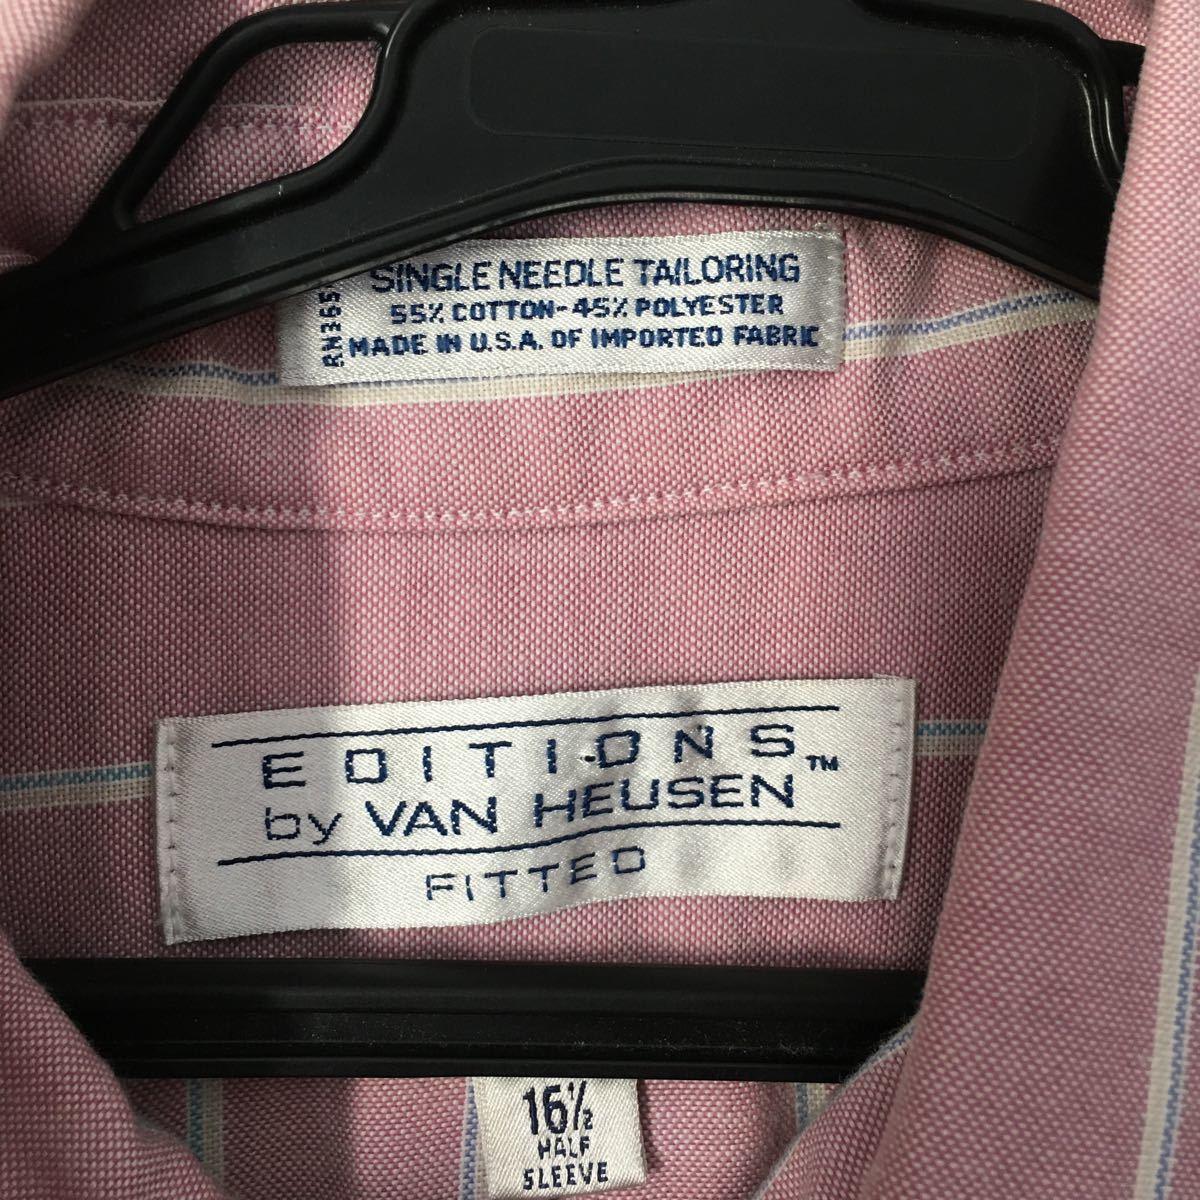 Van Heusen◆ヴァンヒューゼン/半袖シャツ シャツ L ボタンダウンシャツ 半袖 アメカジ